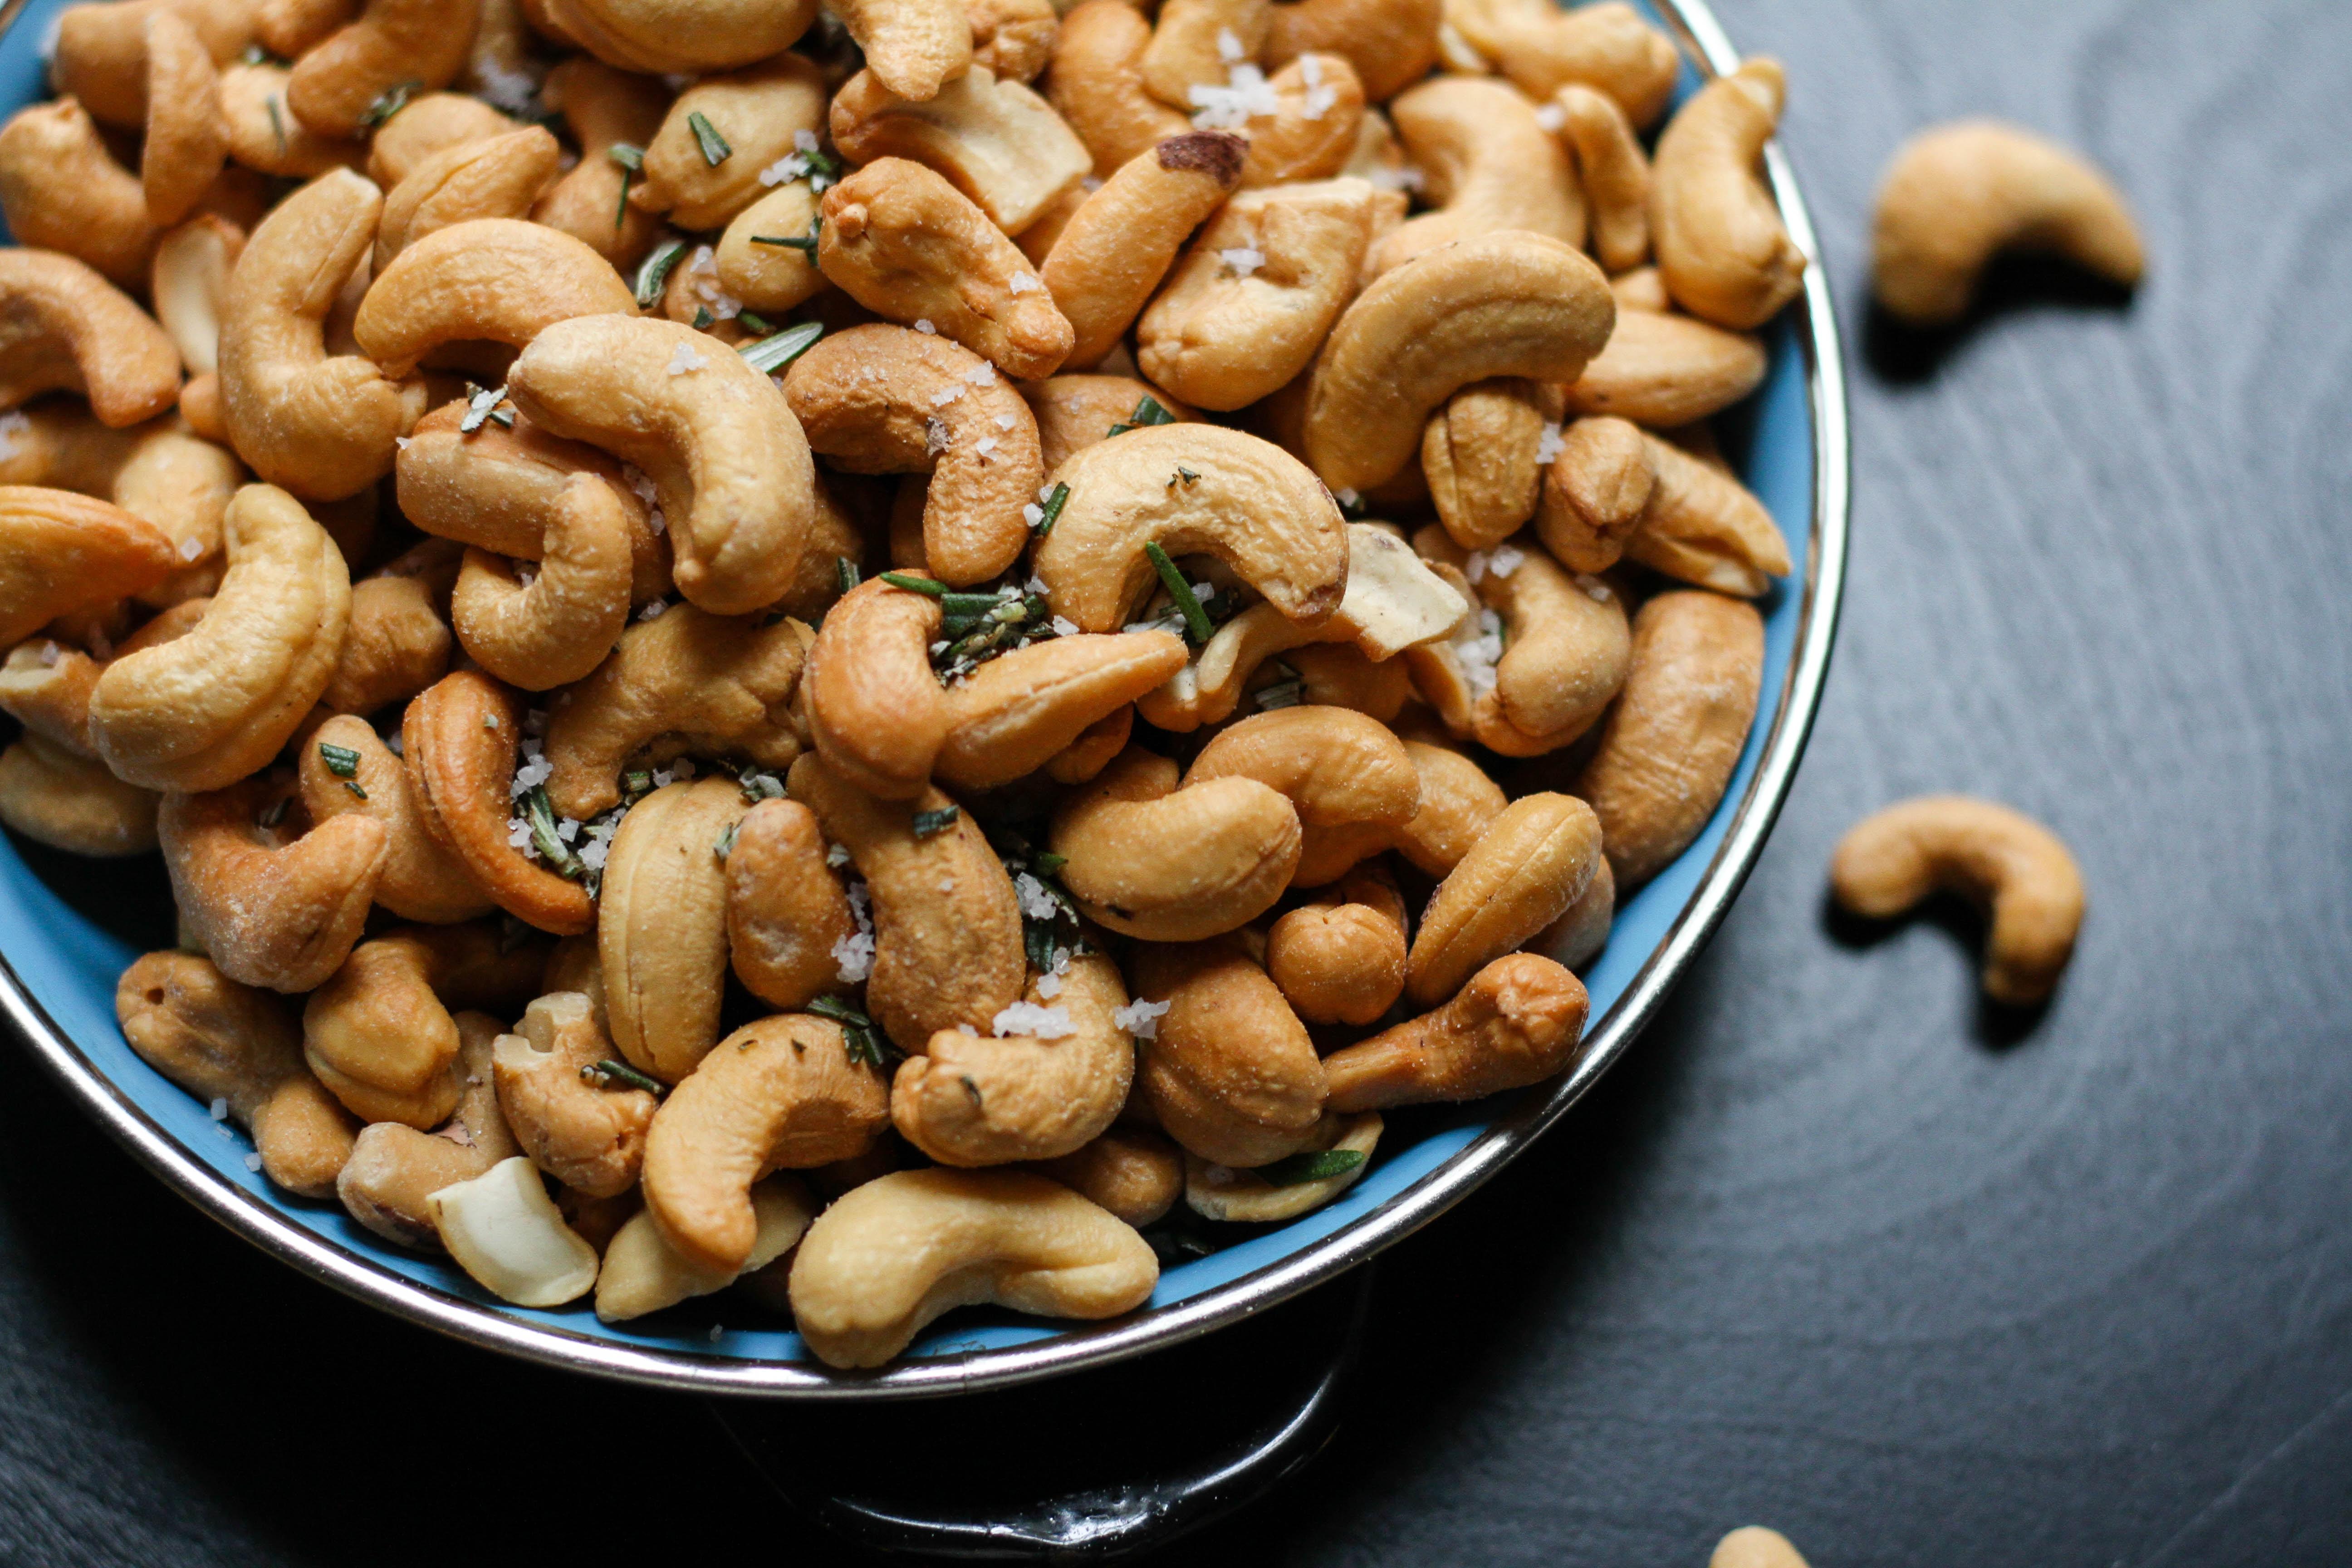 Cashews - Top 10 Vegetarian Items at Aldi